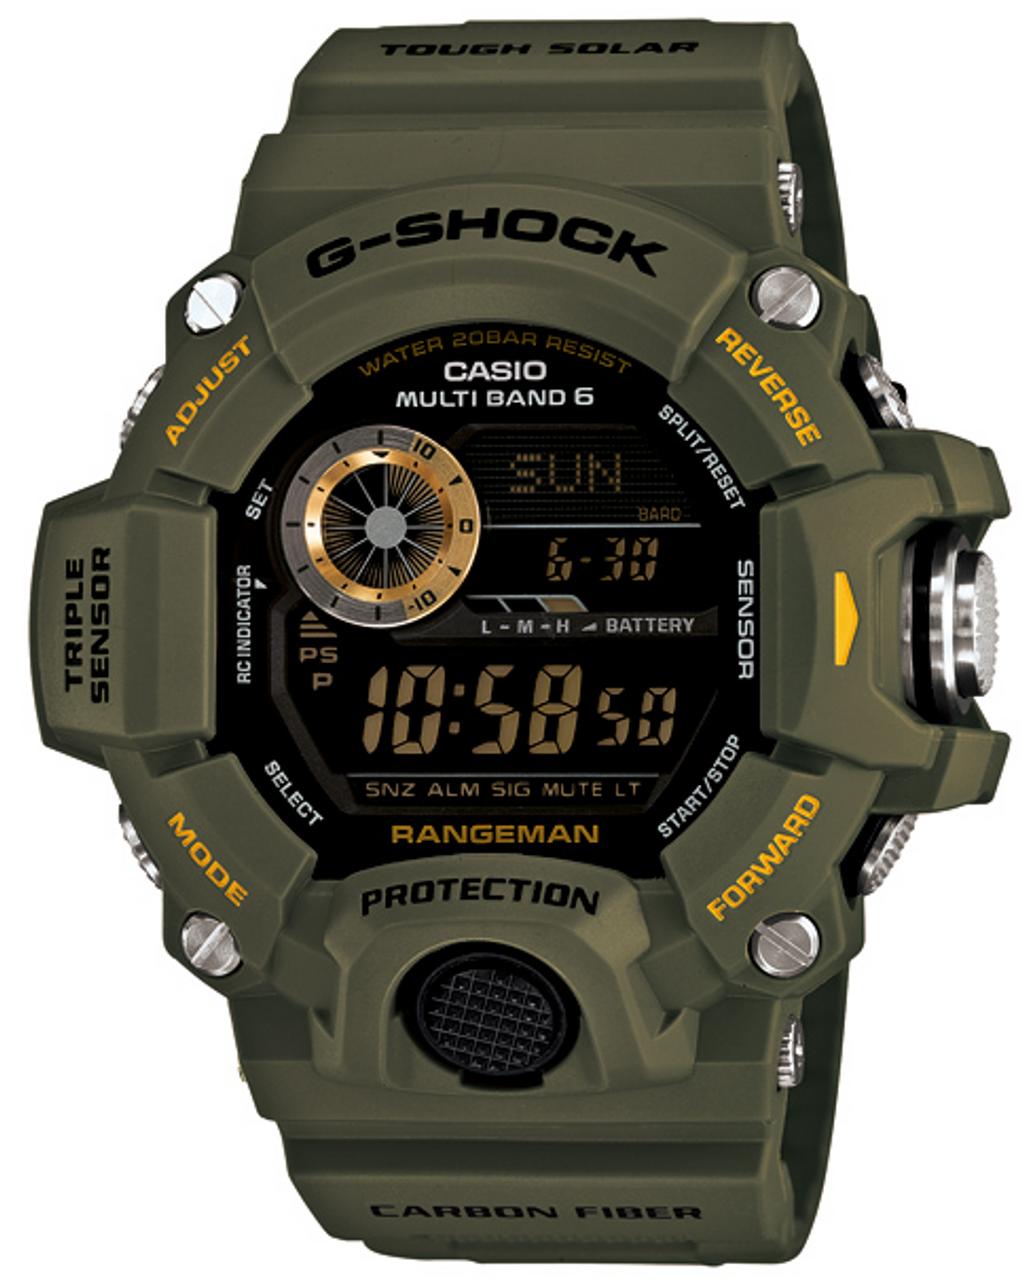 Casio G-Shock Rangeman GW-9400J-3JF